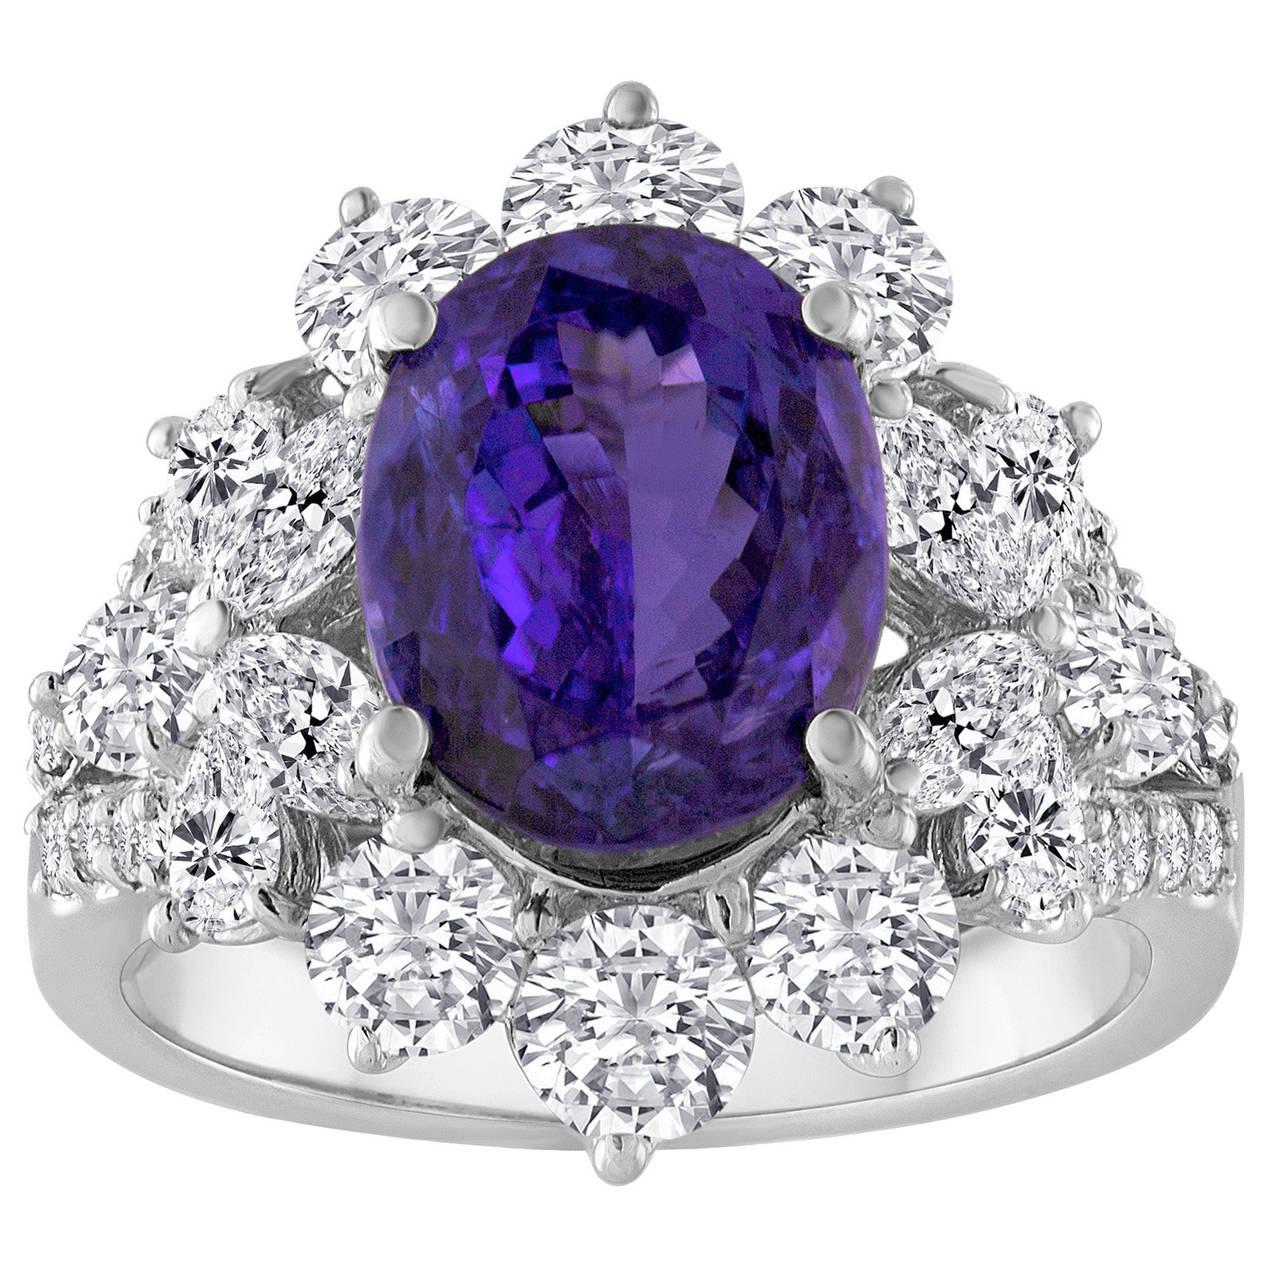 4.10 Carat Oval Cut Tanzanite and Diamond18K Gold Ring